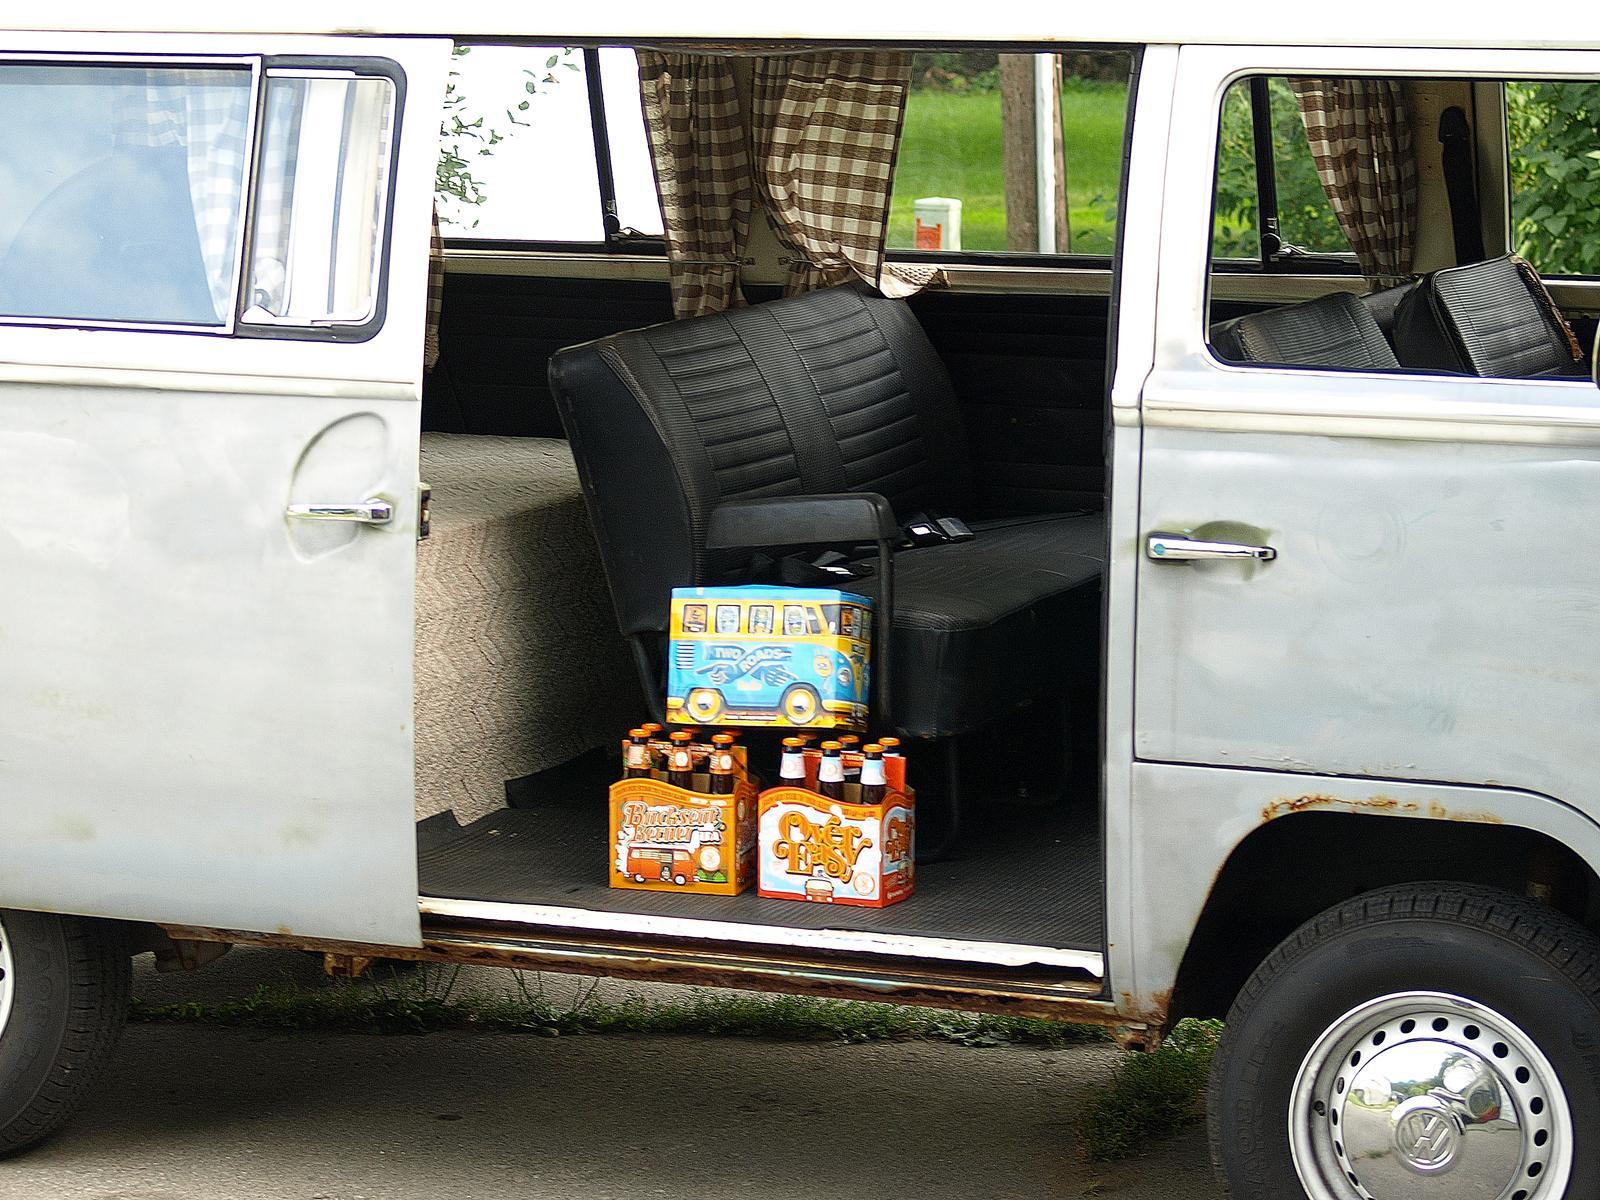 Bus Themed Beer in my Deluxe